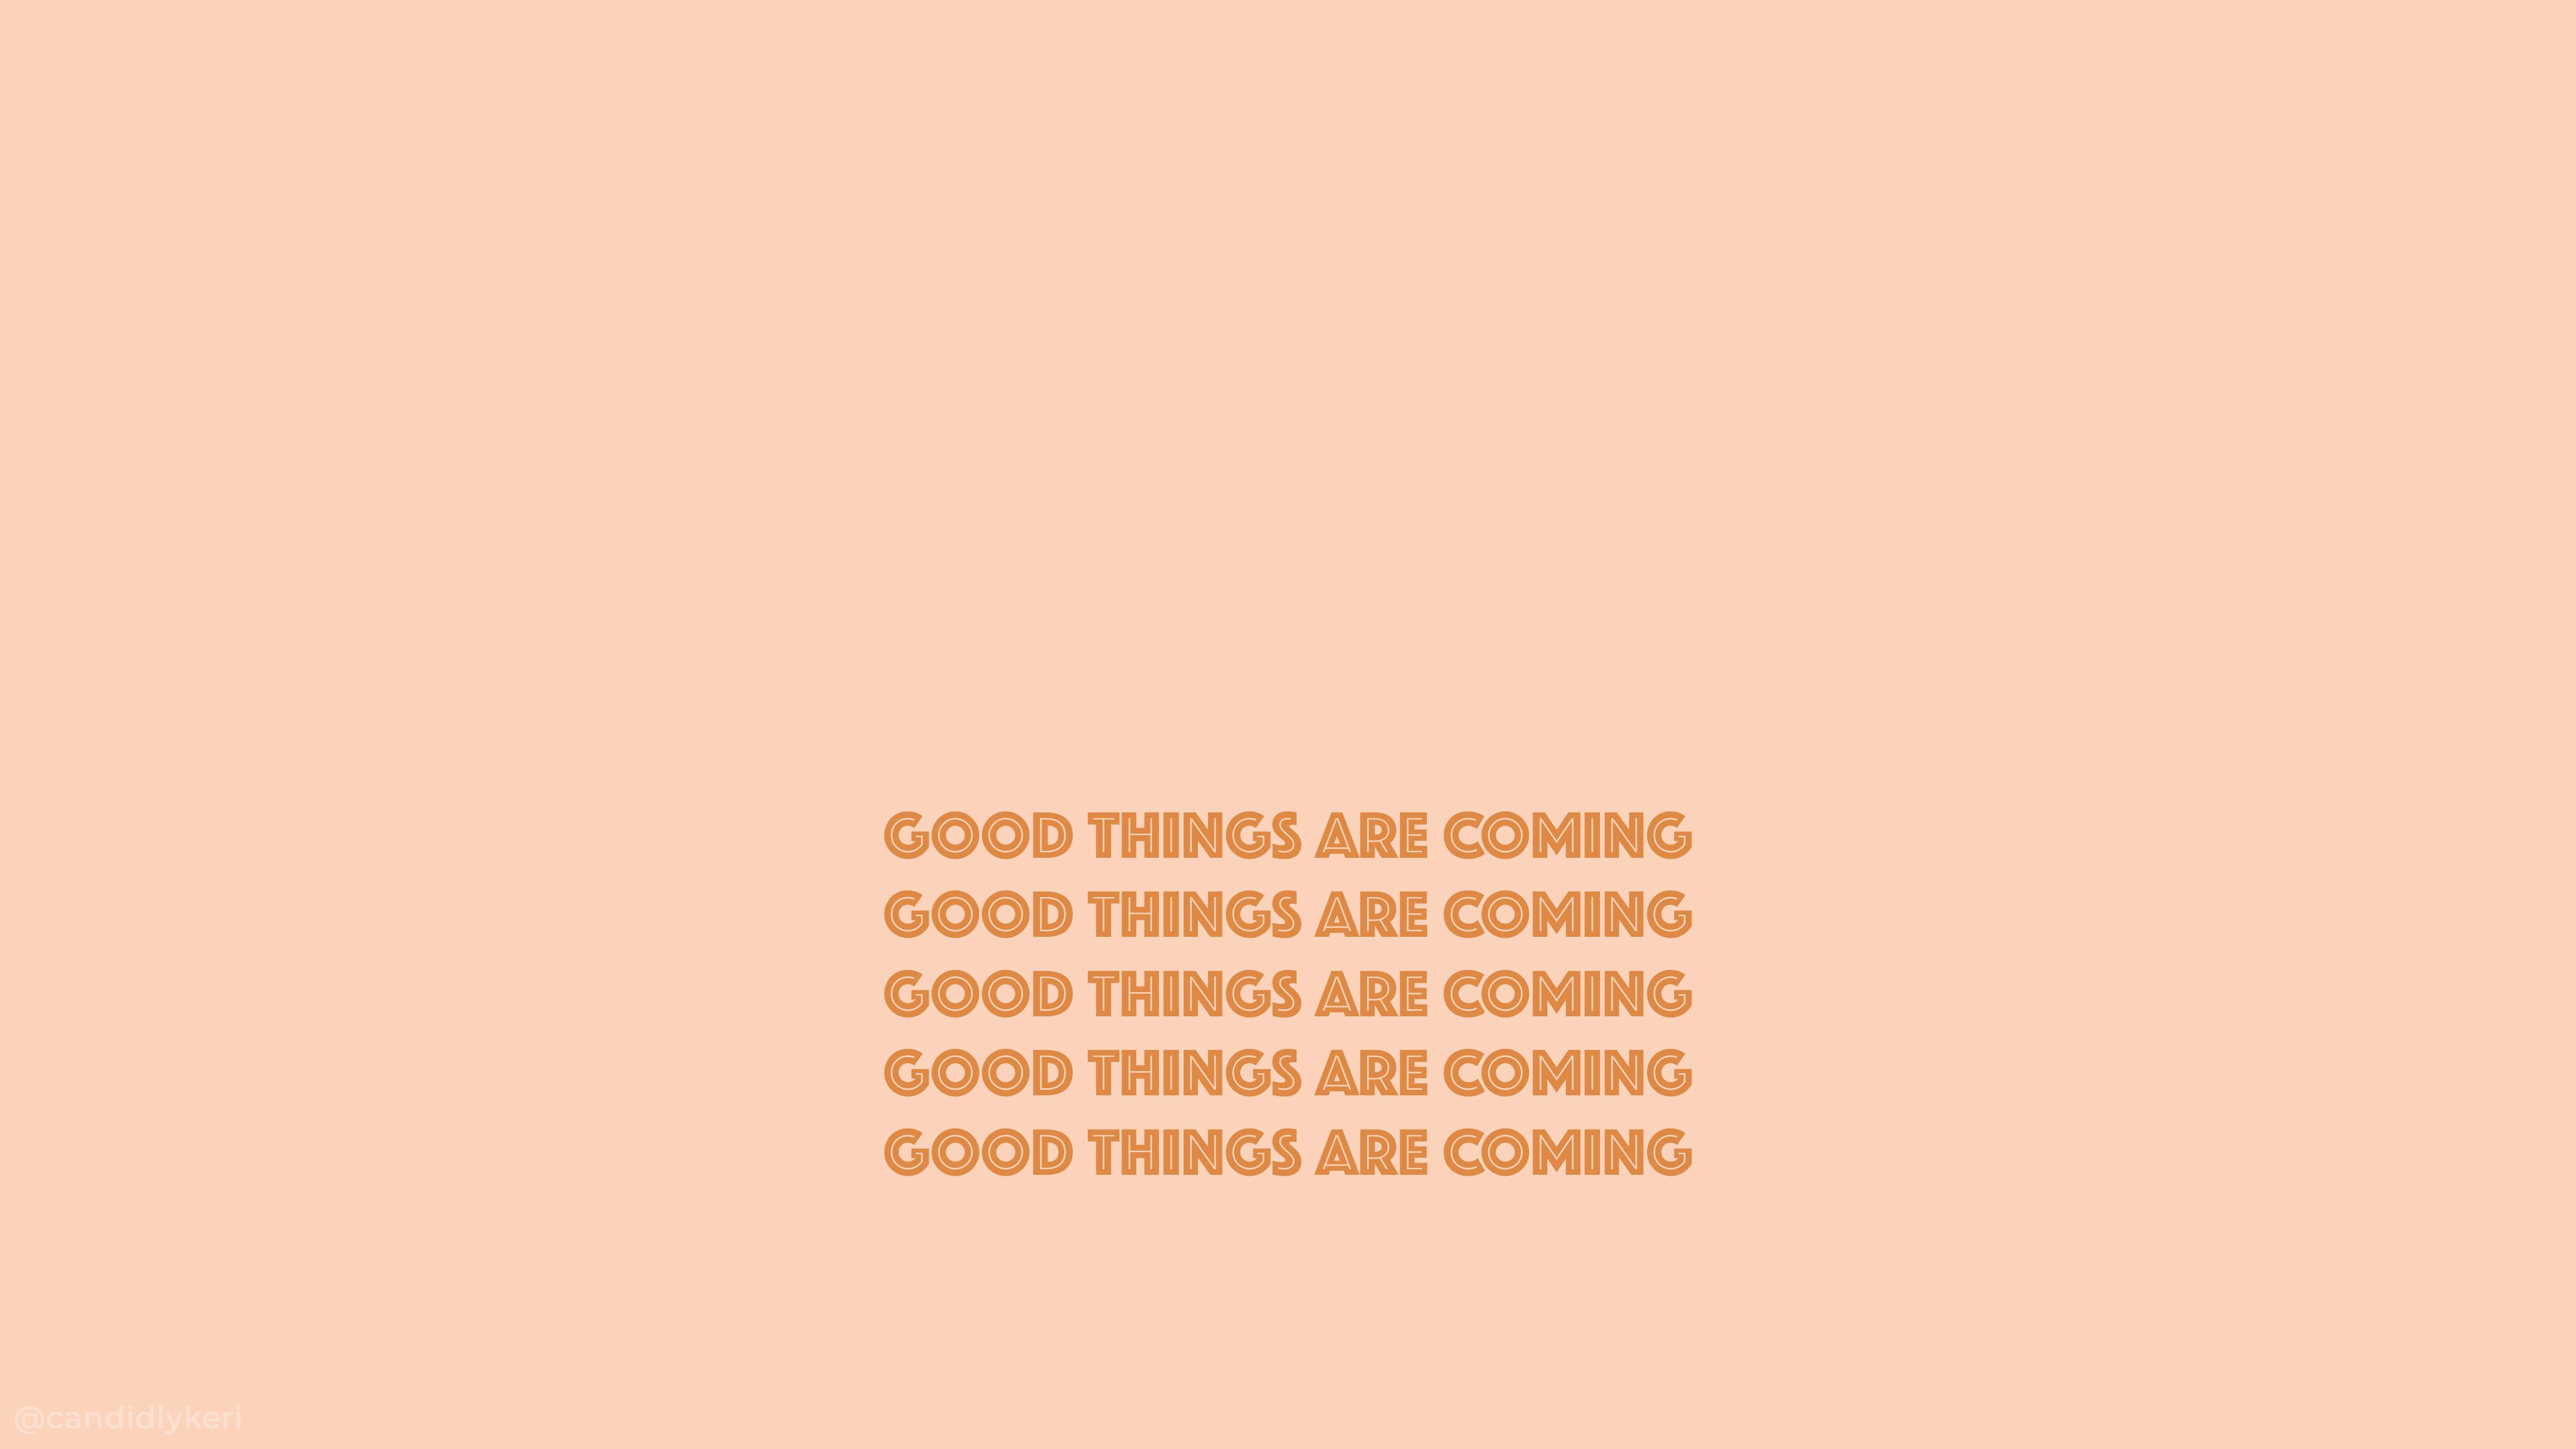 Tan Aesthetic Wallpaper Quotes